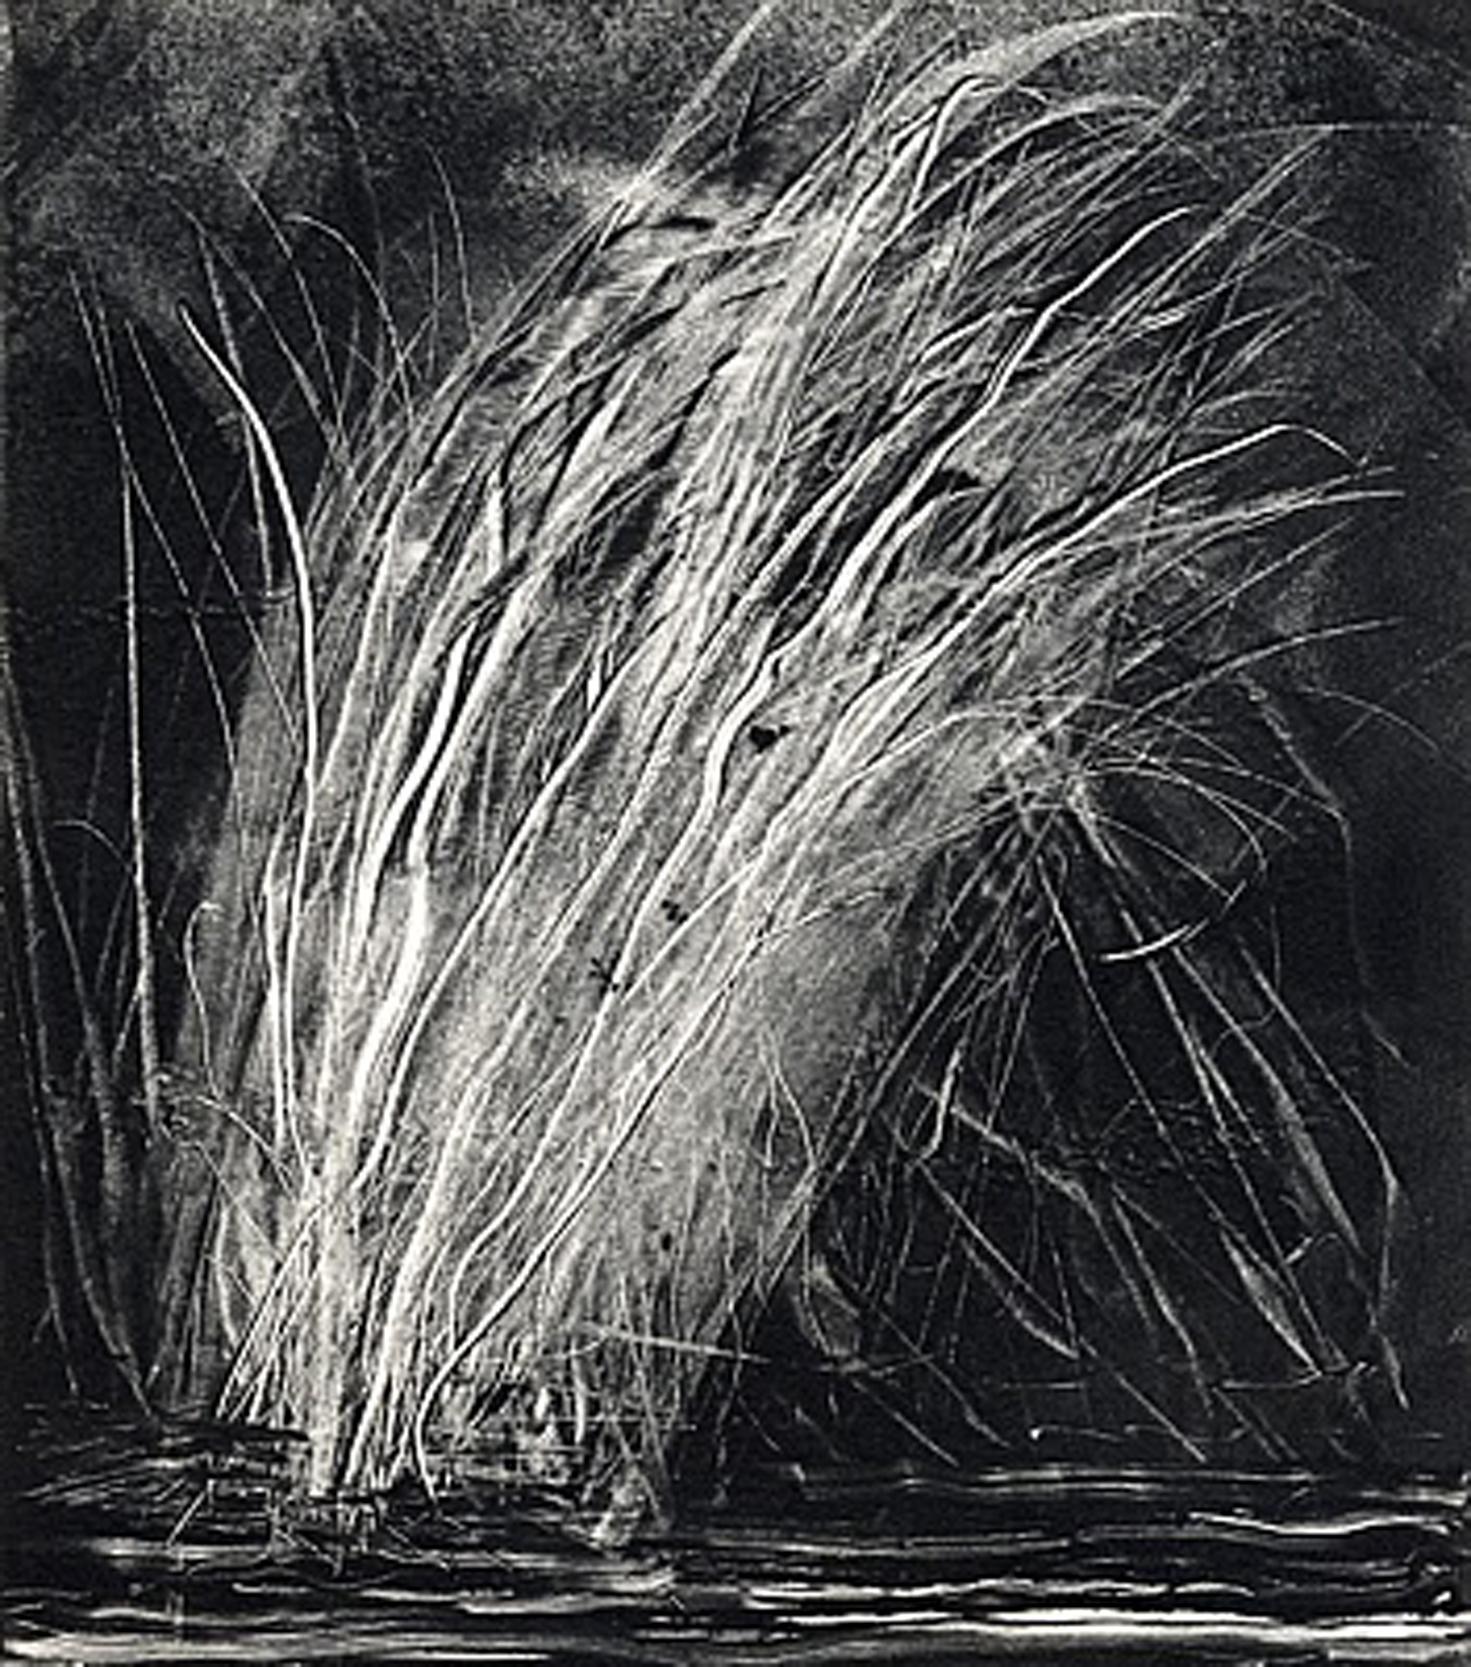 Grasses #0